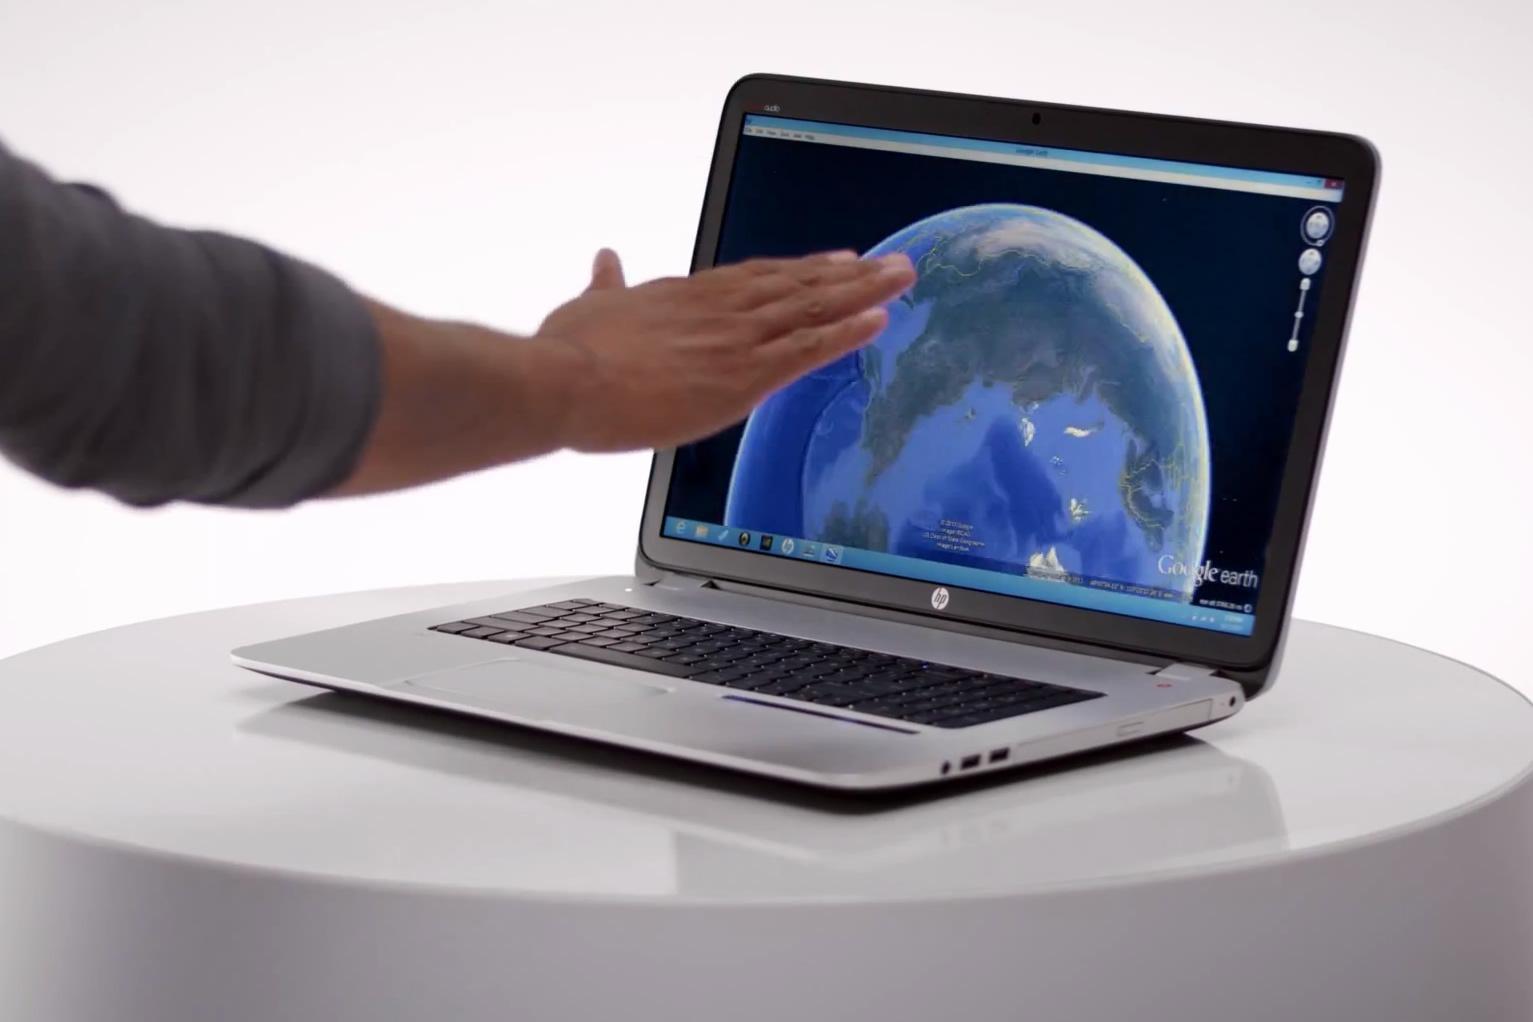 Buy Leap Motion 3d Controller Somatosensory Gesture Motion